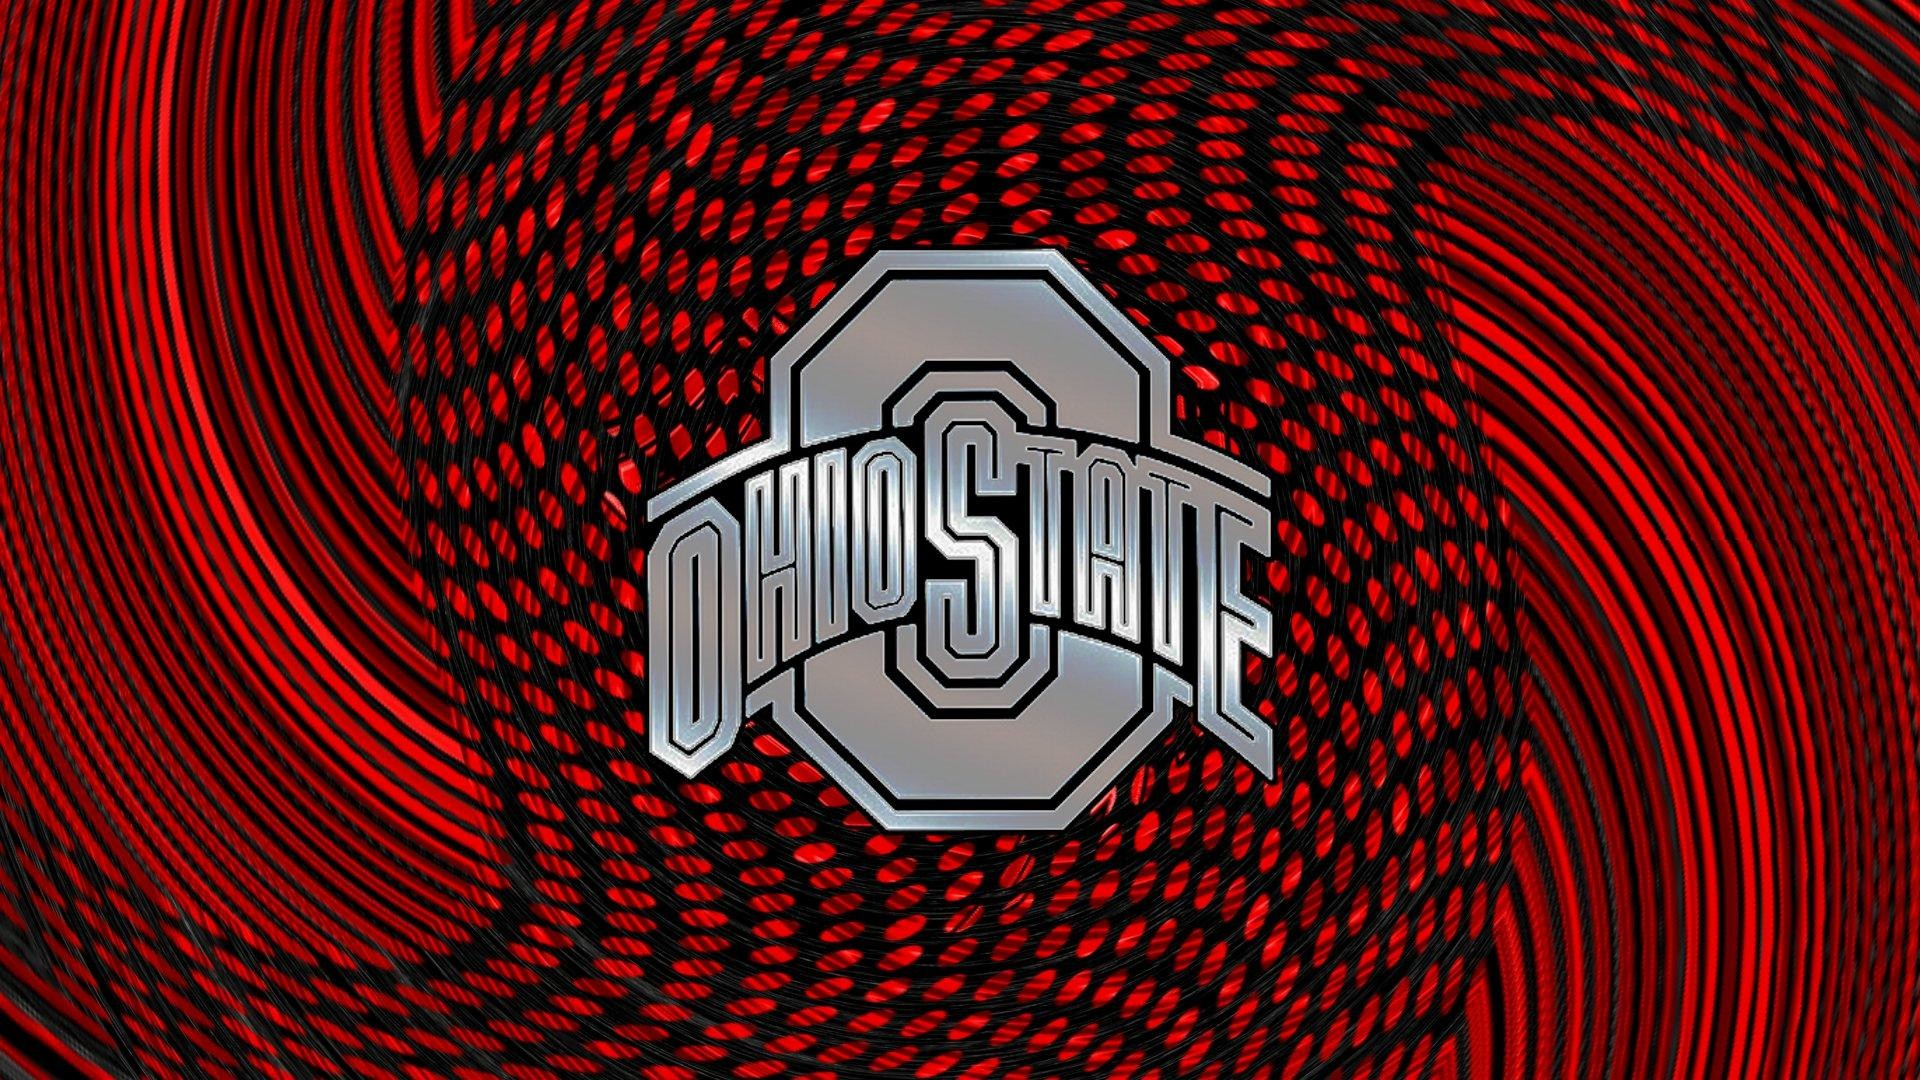 OSU-Wallpaper-ohio-state-football